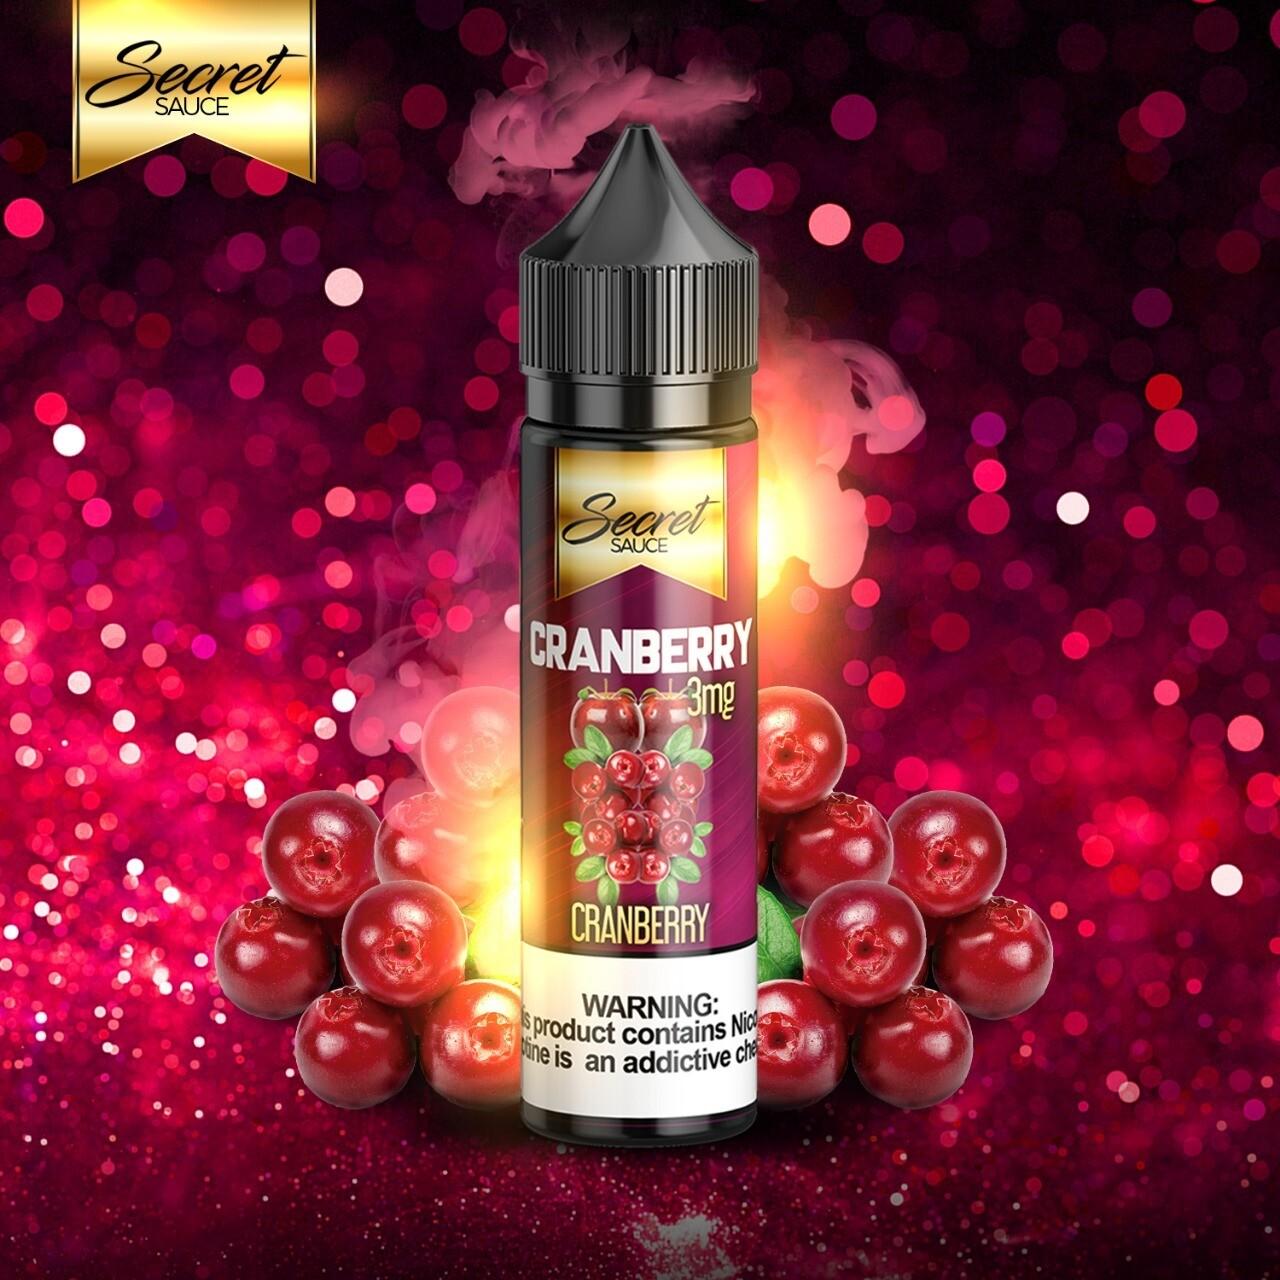 Secret Sauce Cranberry سيكريت صوص تفاح وكرز